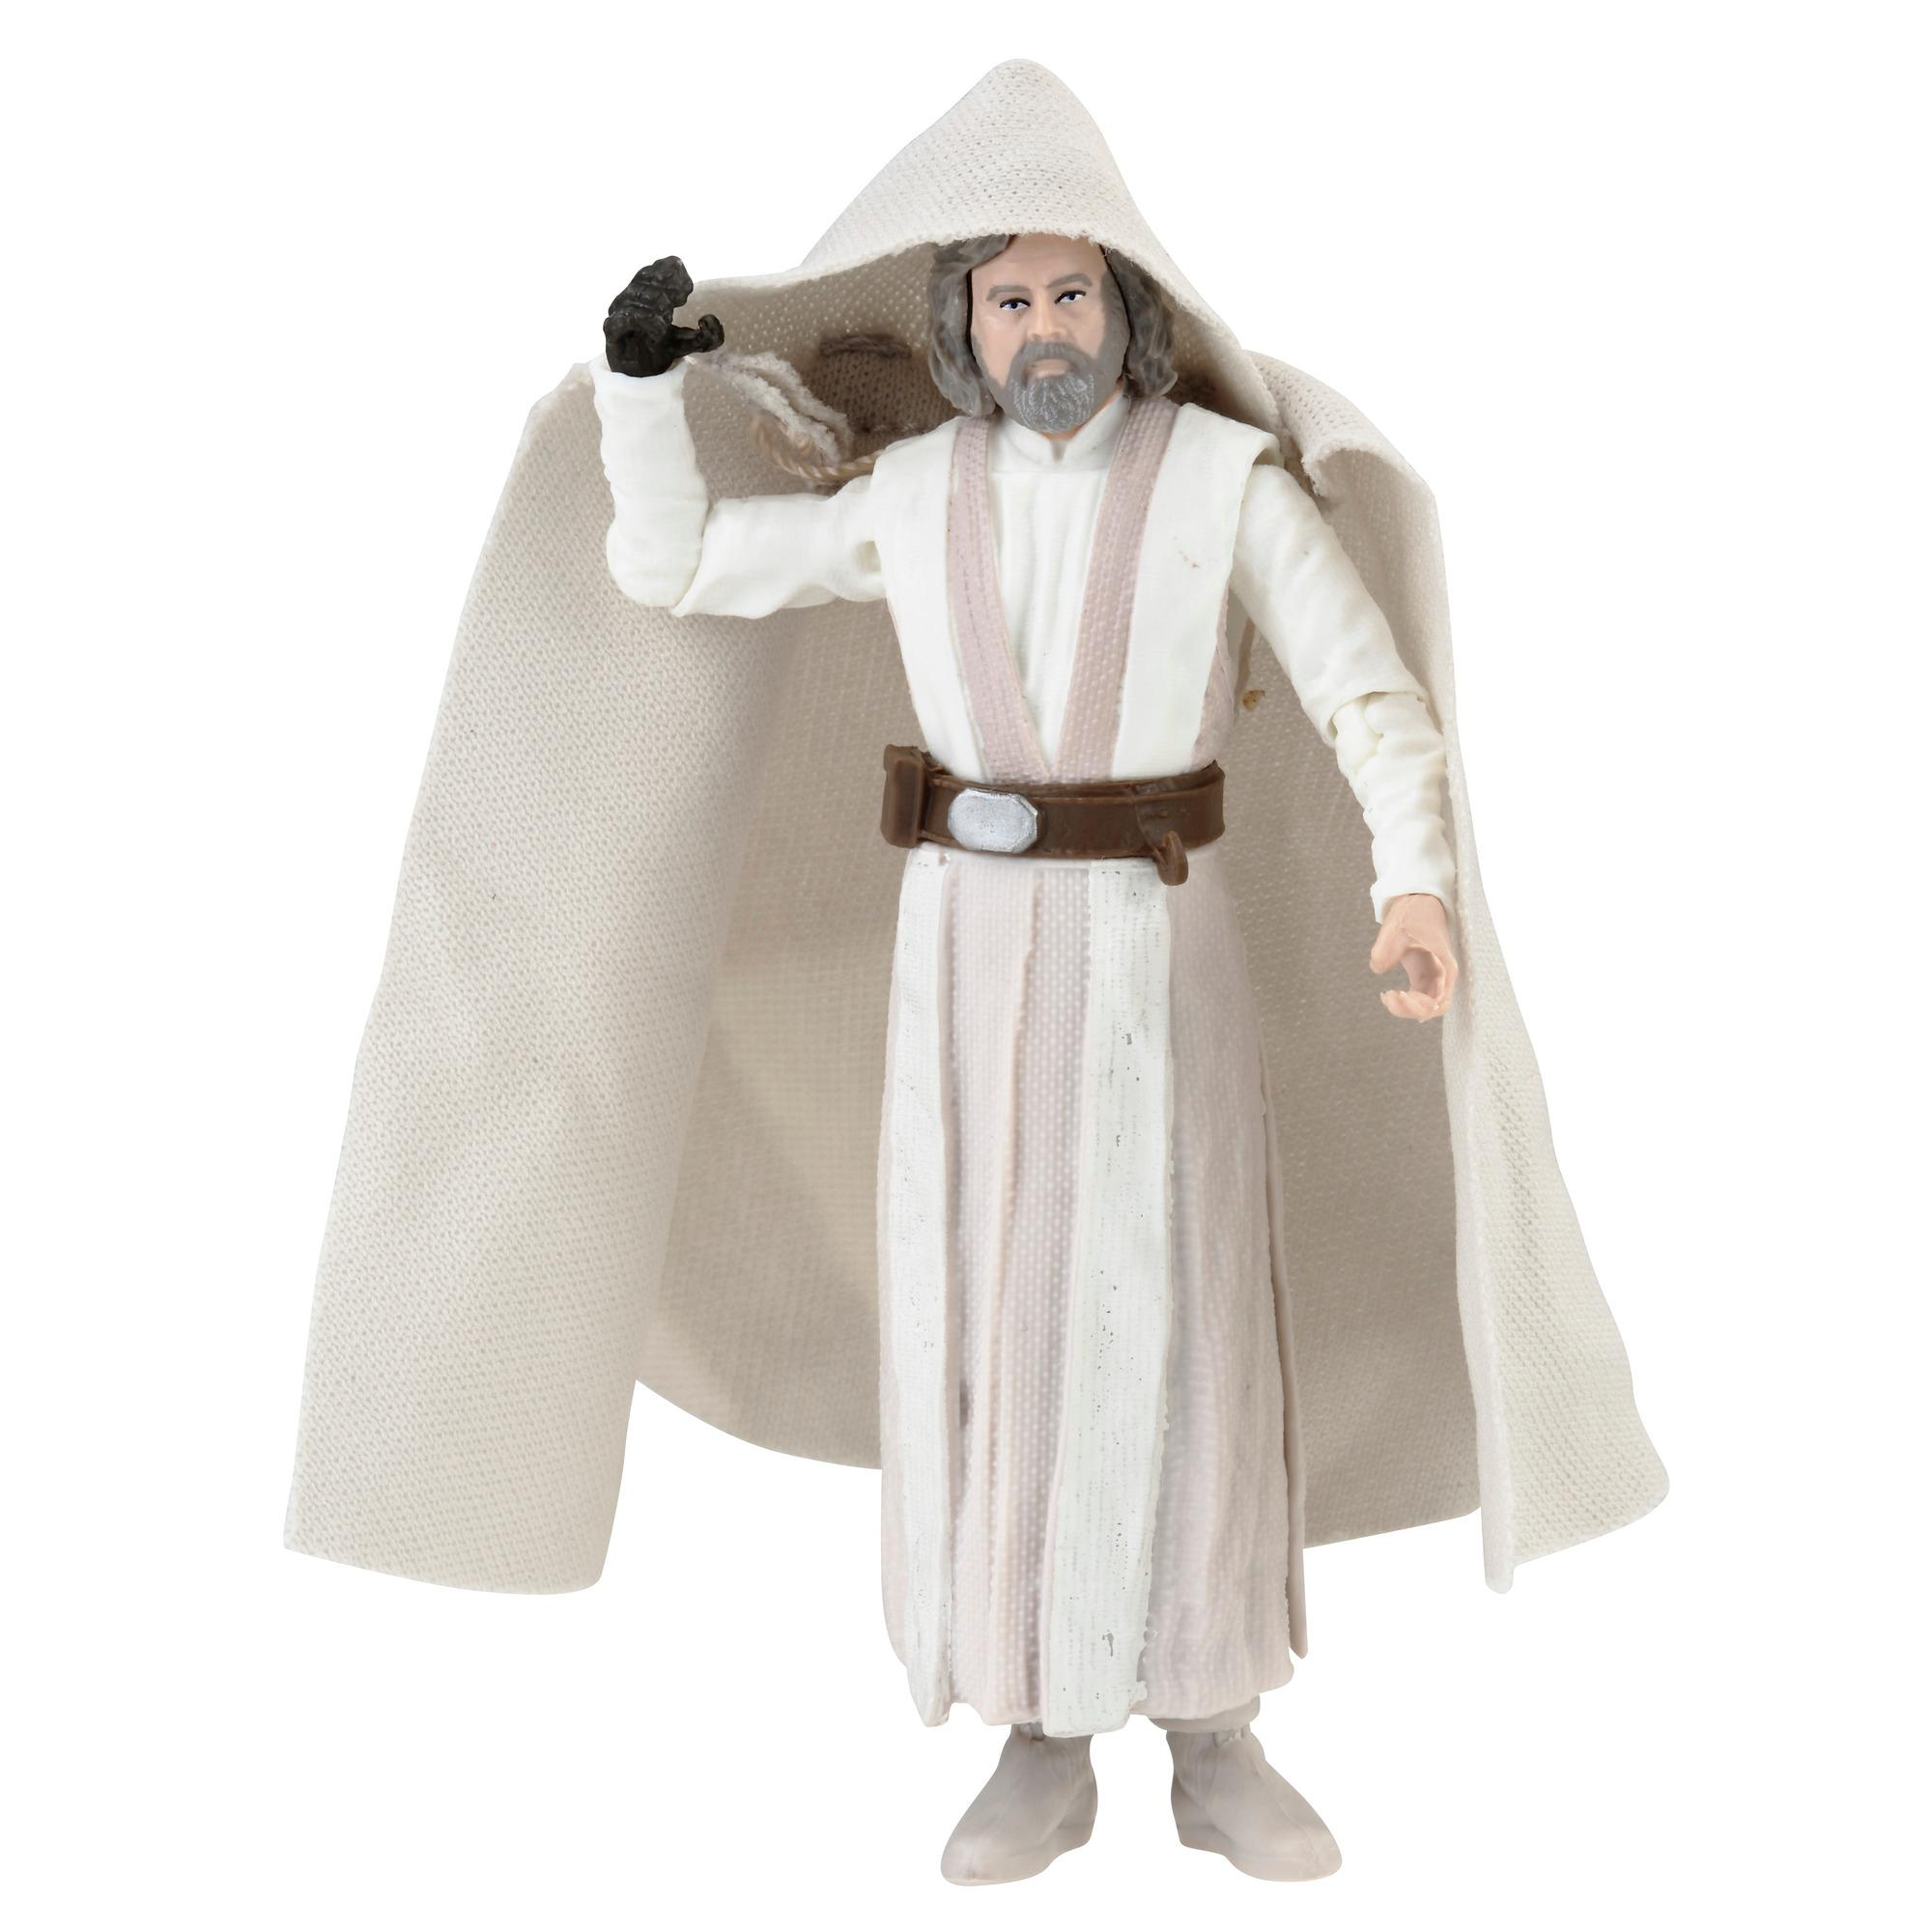 Star Wars The Vintage Collection Luke Skywalker (Jedi Master) 3.75-inch Figure